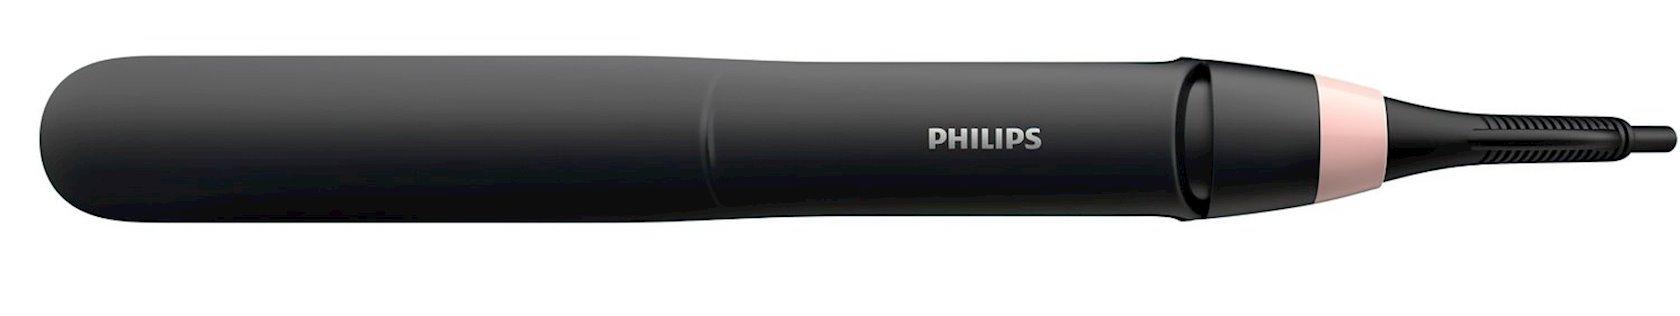 Saç düzləndiricisi Philips StraightCare Essential BHS378/00